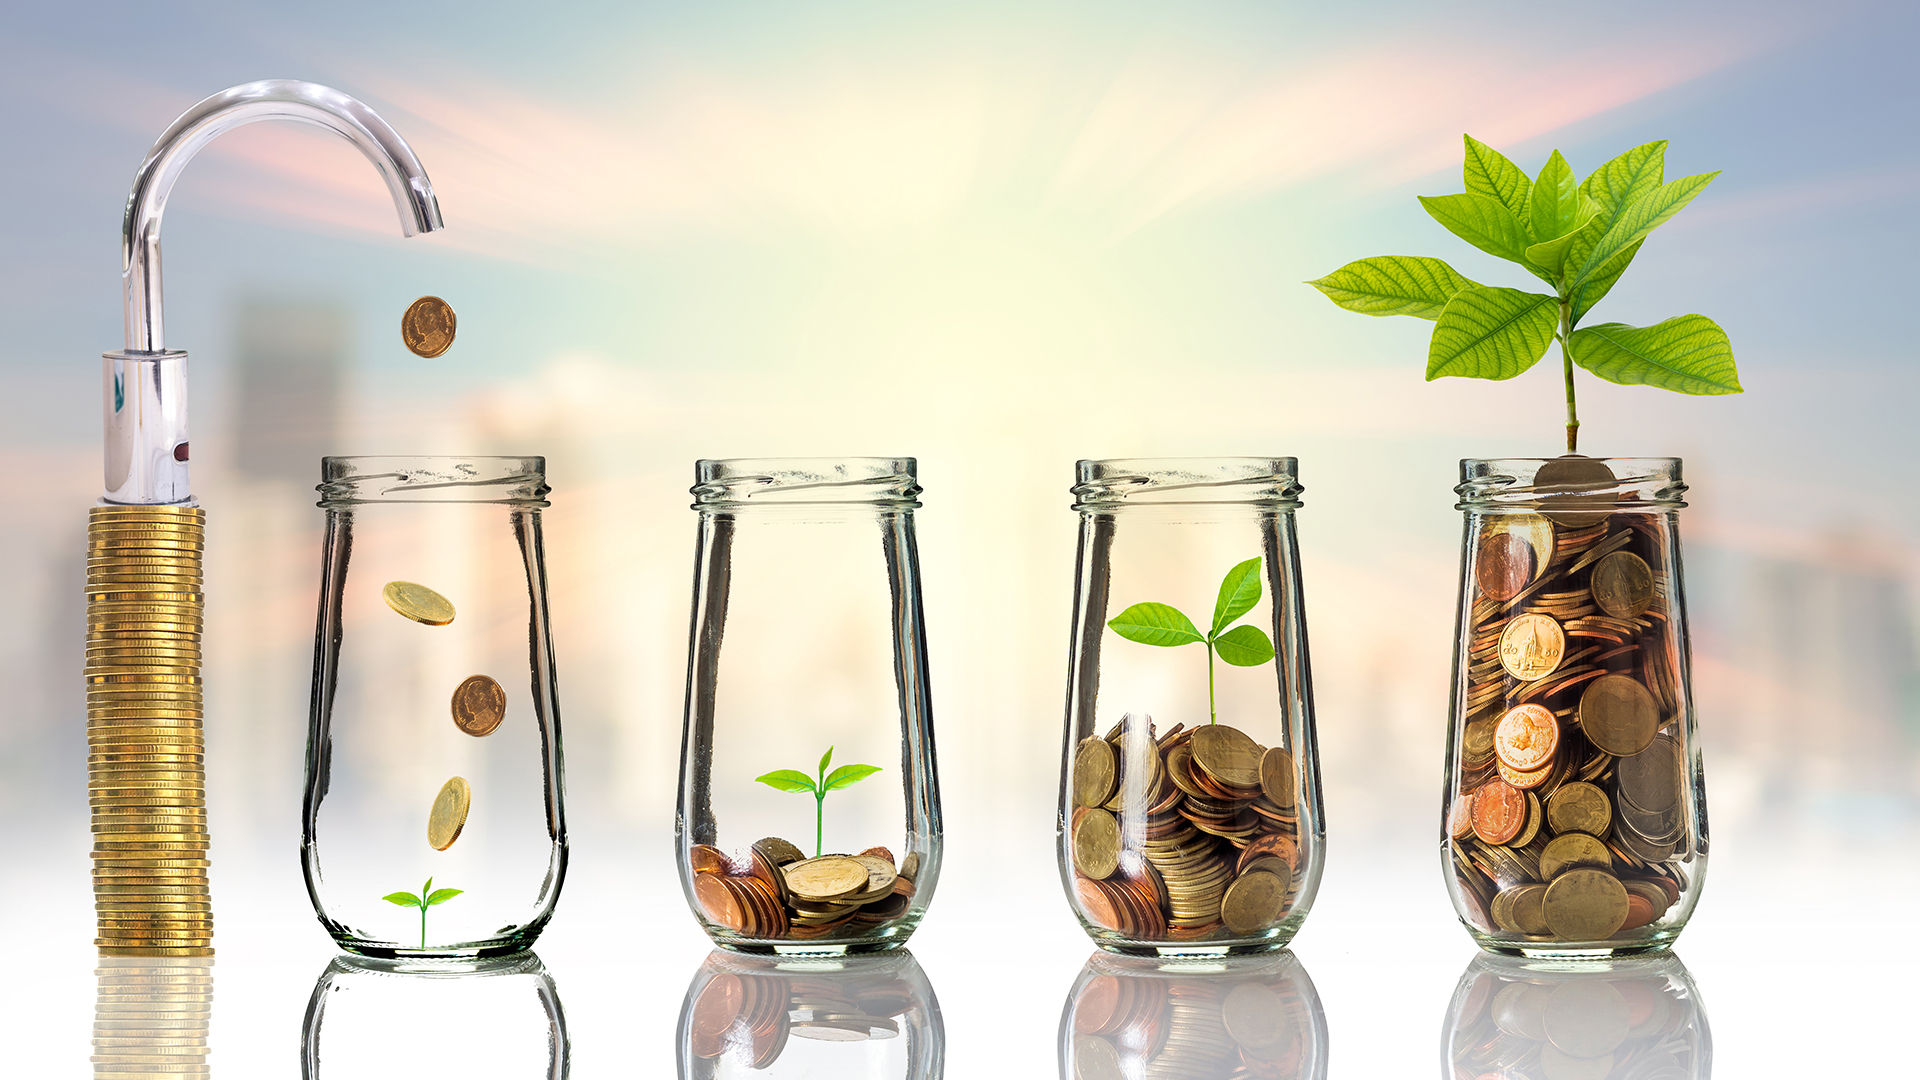 Strategies to choose broker accounts